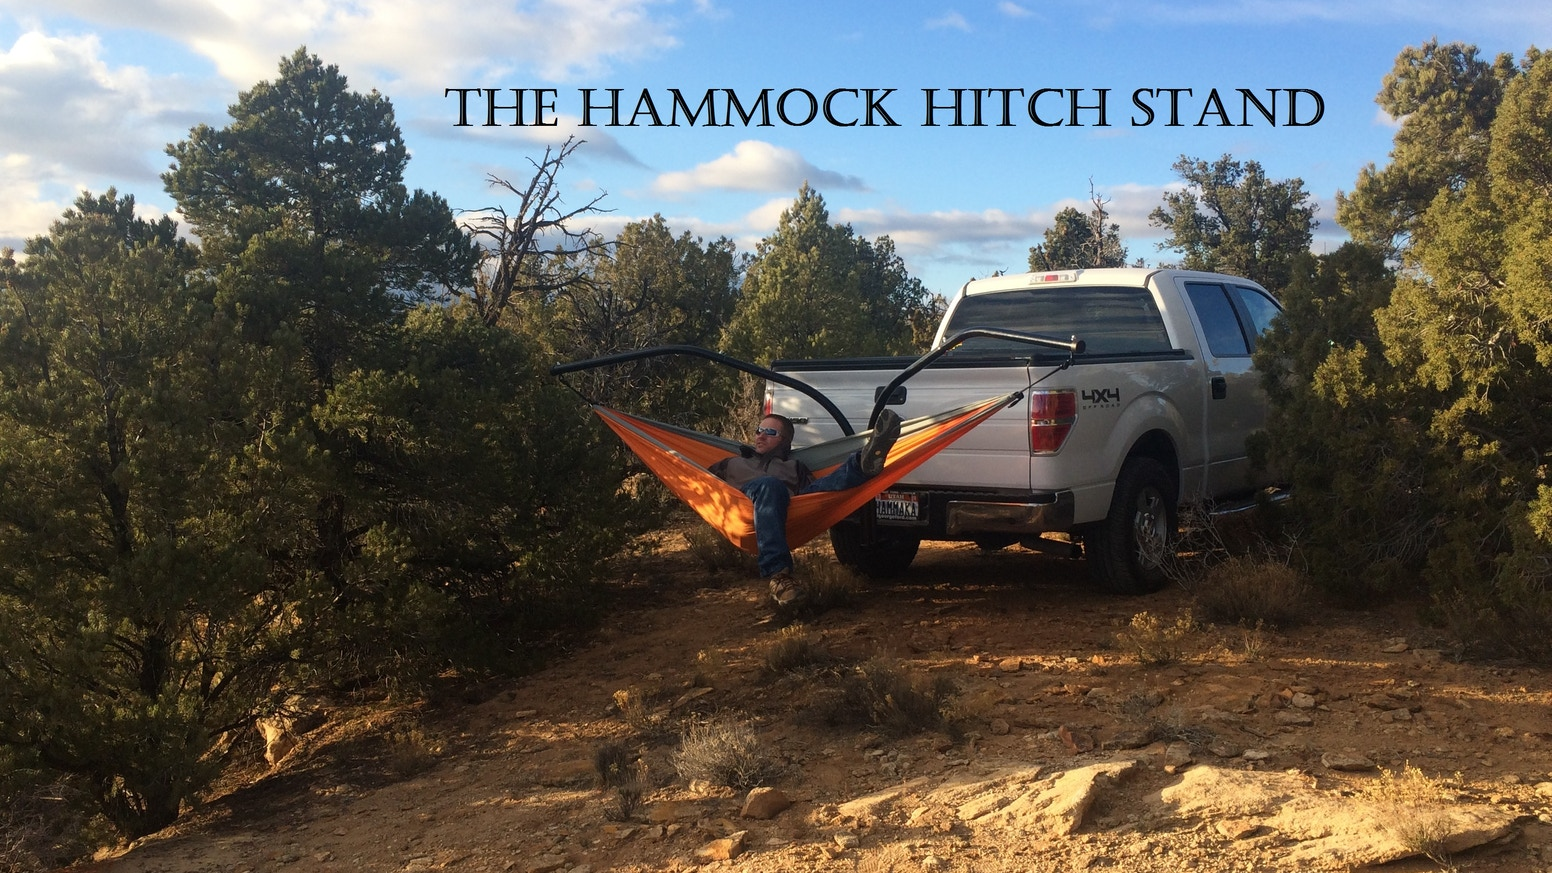 The Hammock Hitch Stand by King's Pond/ Hammaka — Kickstarter